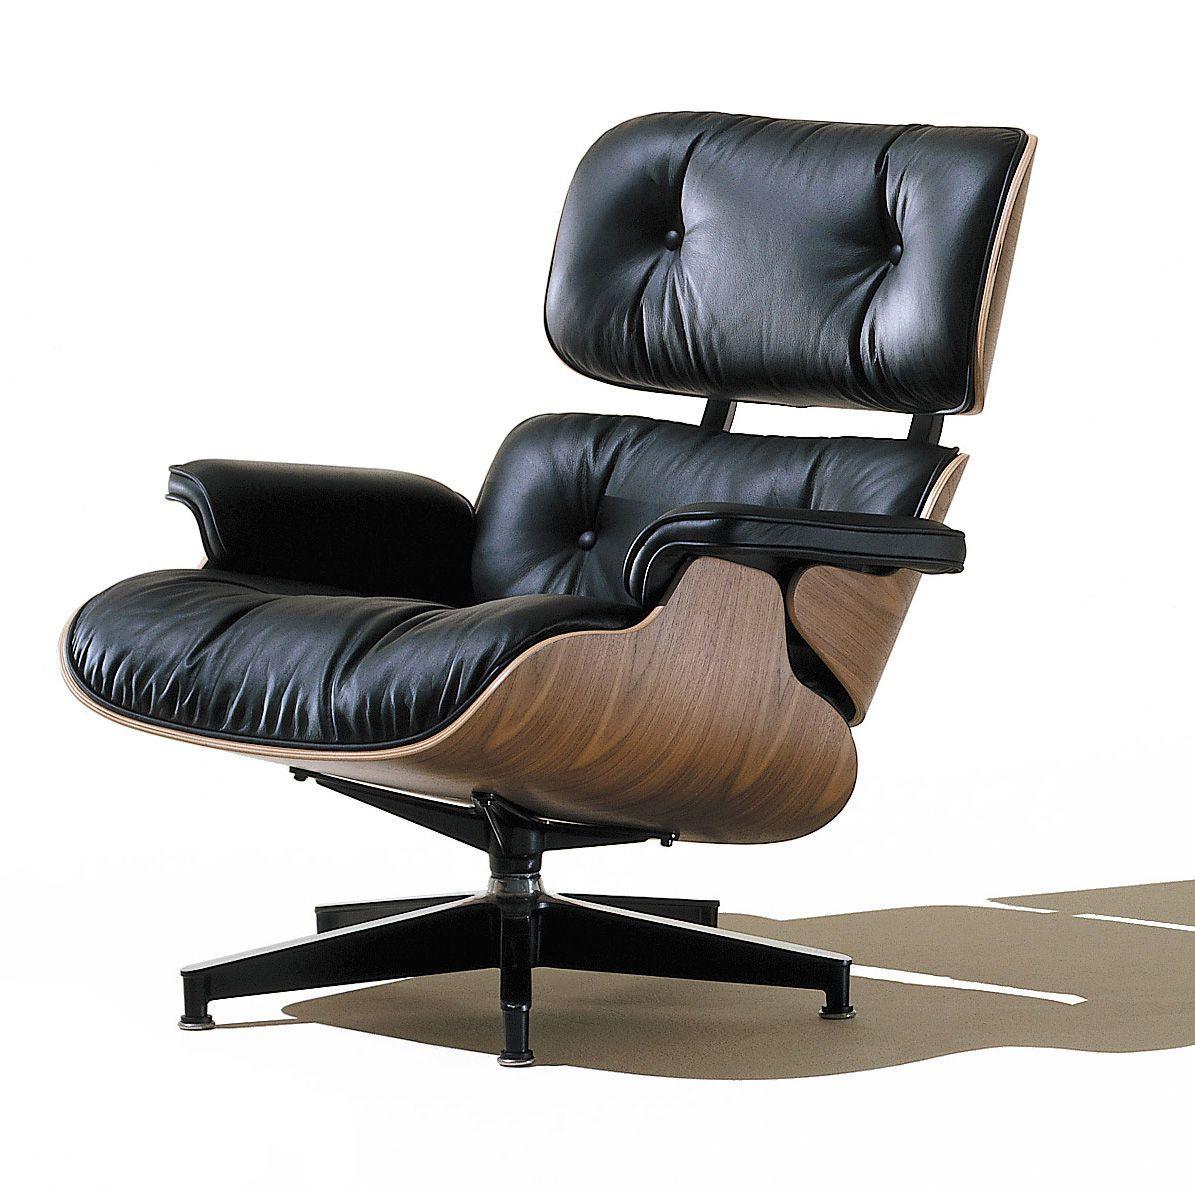 Herman Miller Eames Lounge Chair Allmodern Eames Lounge